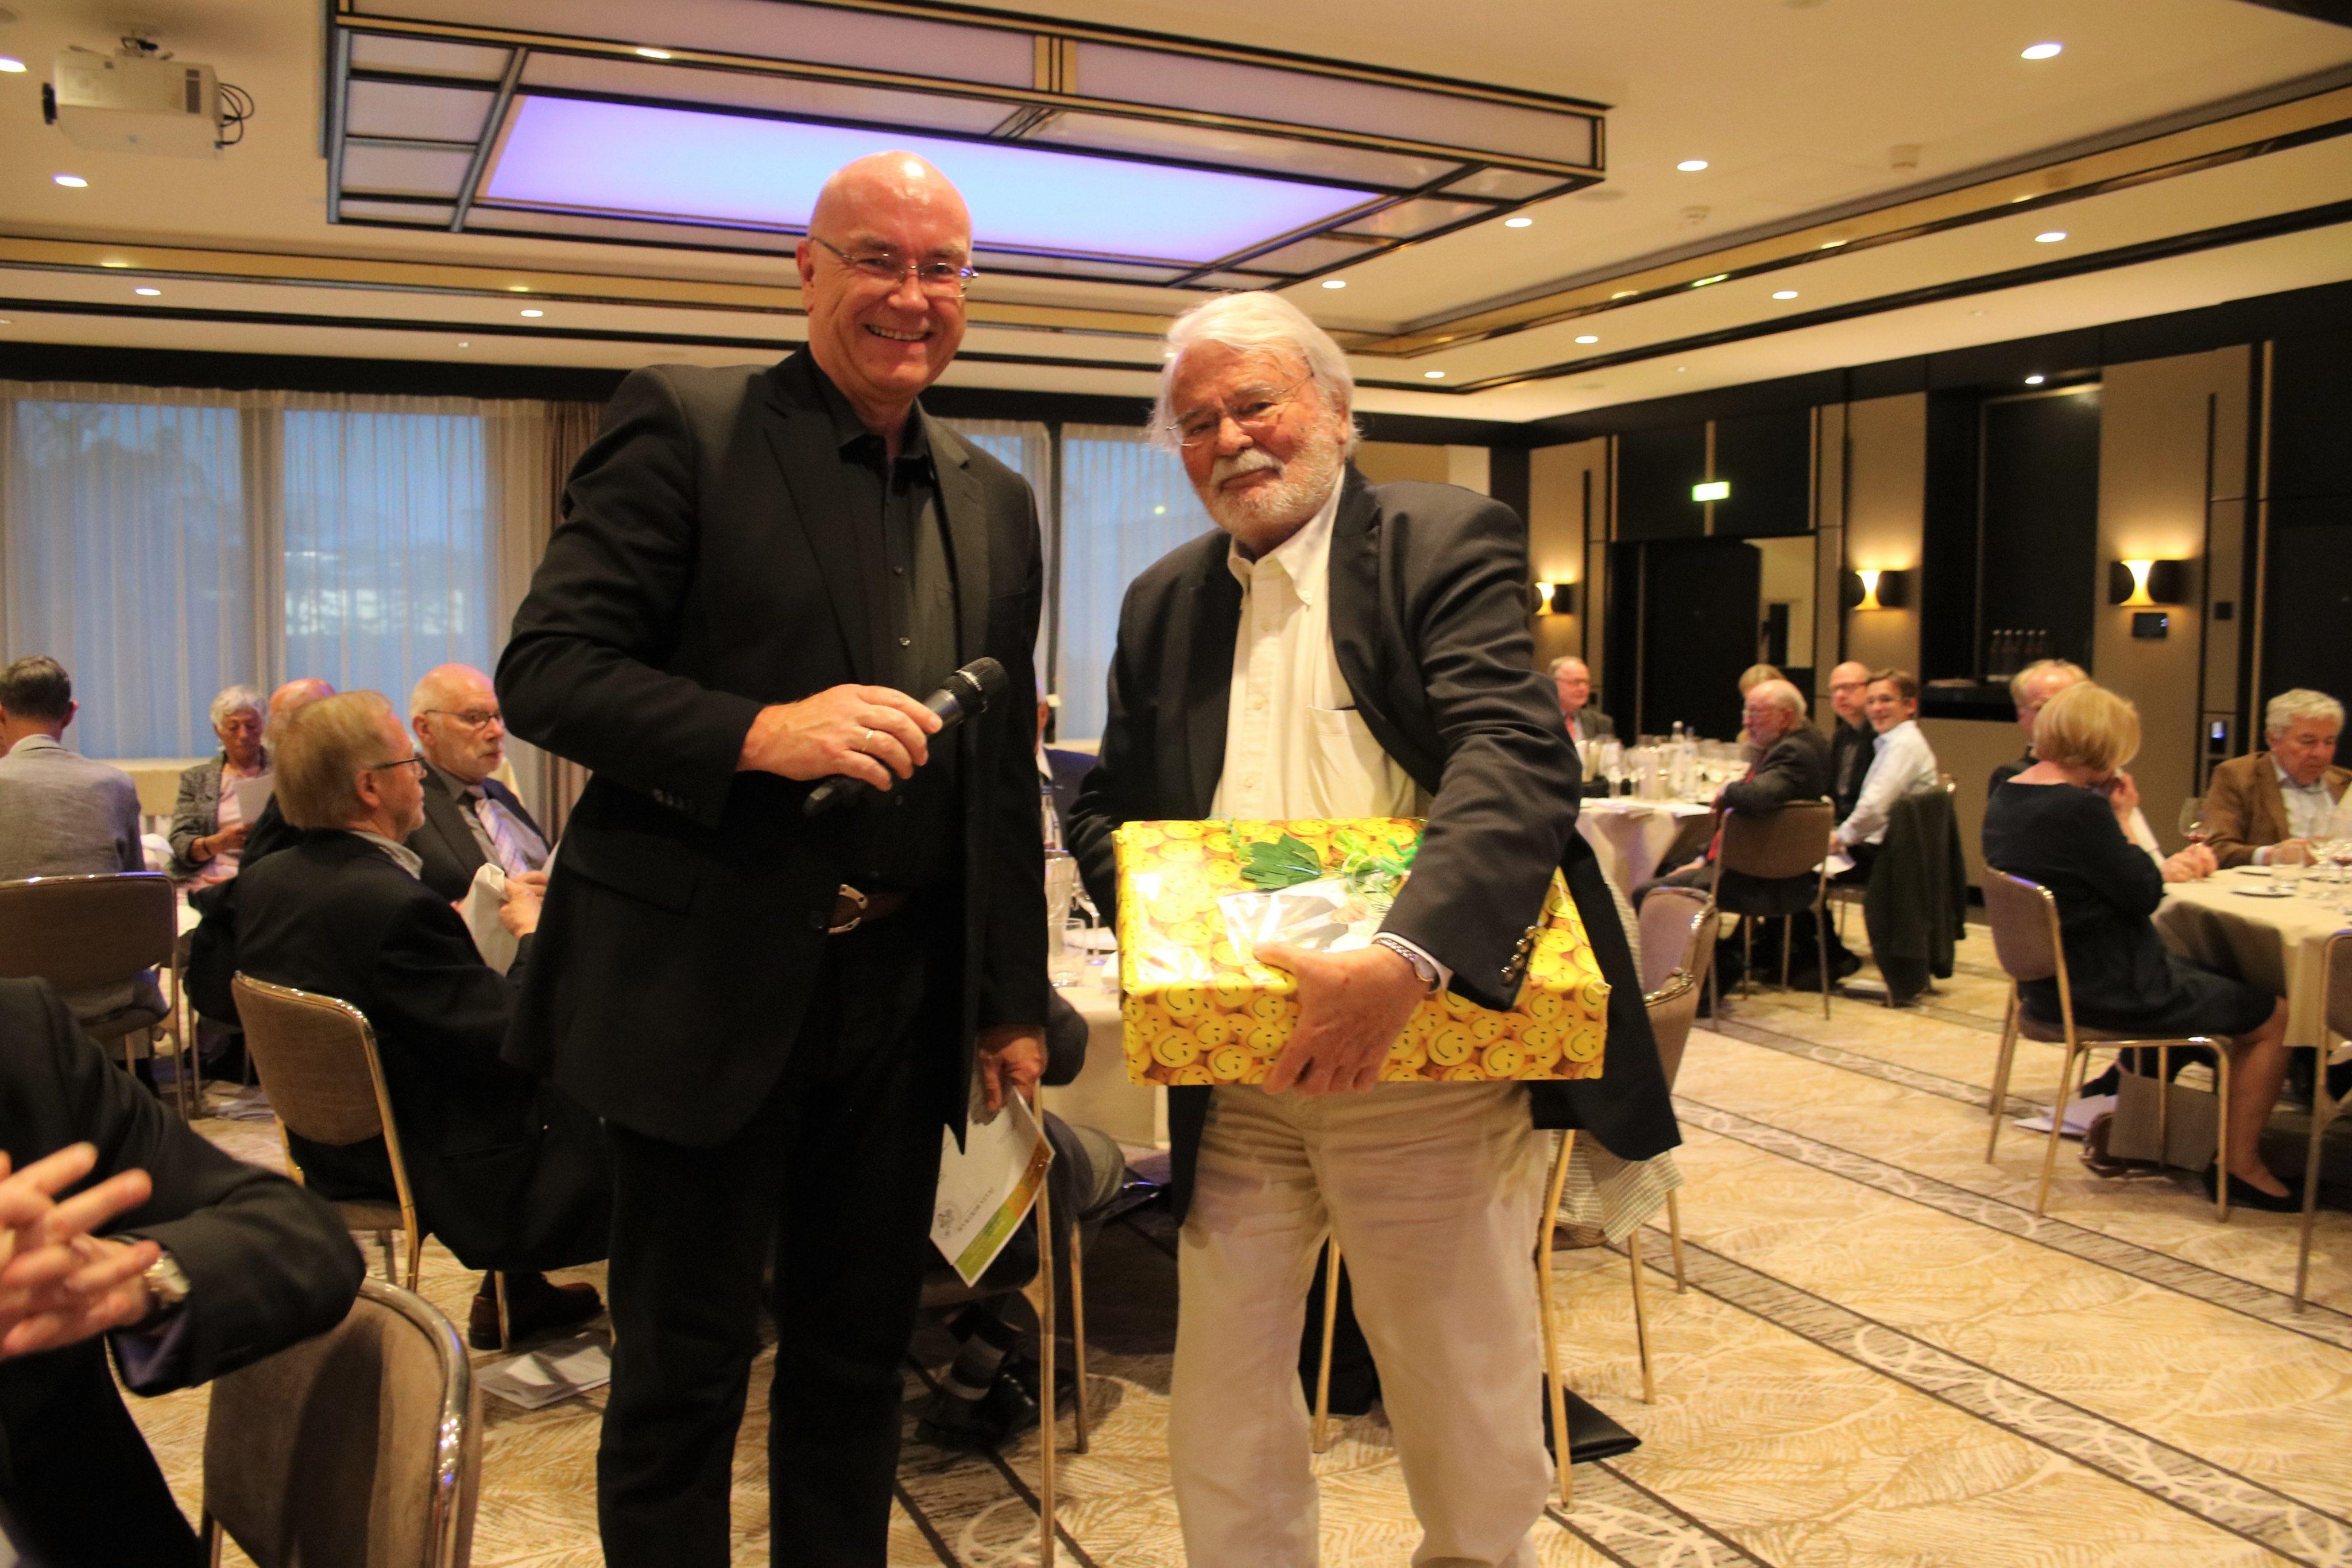 Collegium Vini 25.4.2019 Klaus Rössler und Dr. Peter Hilgard